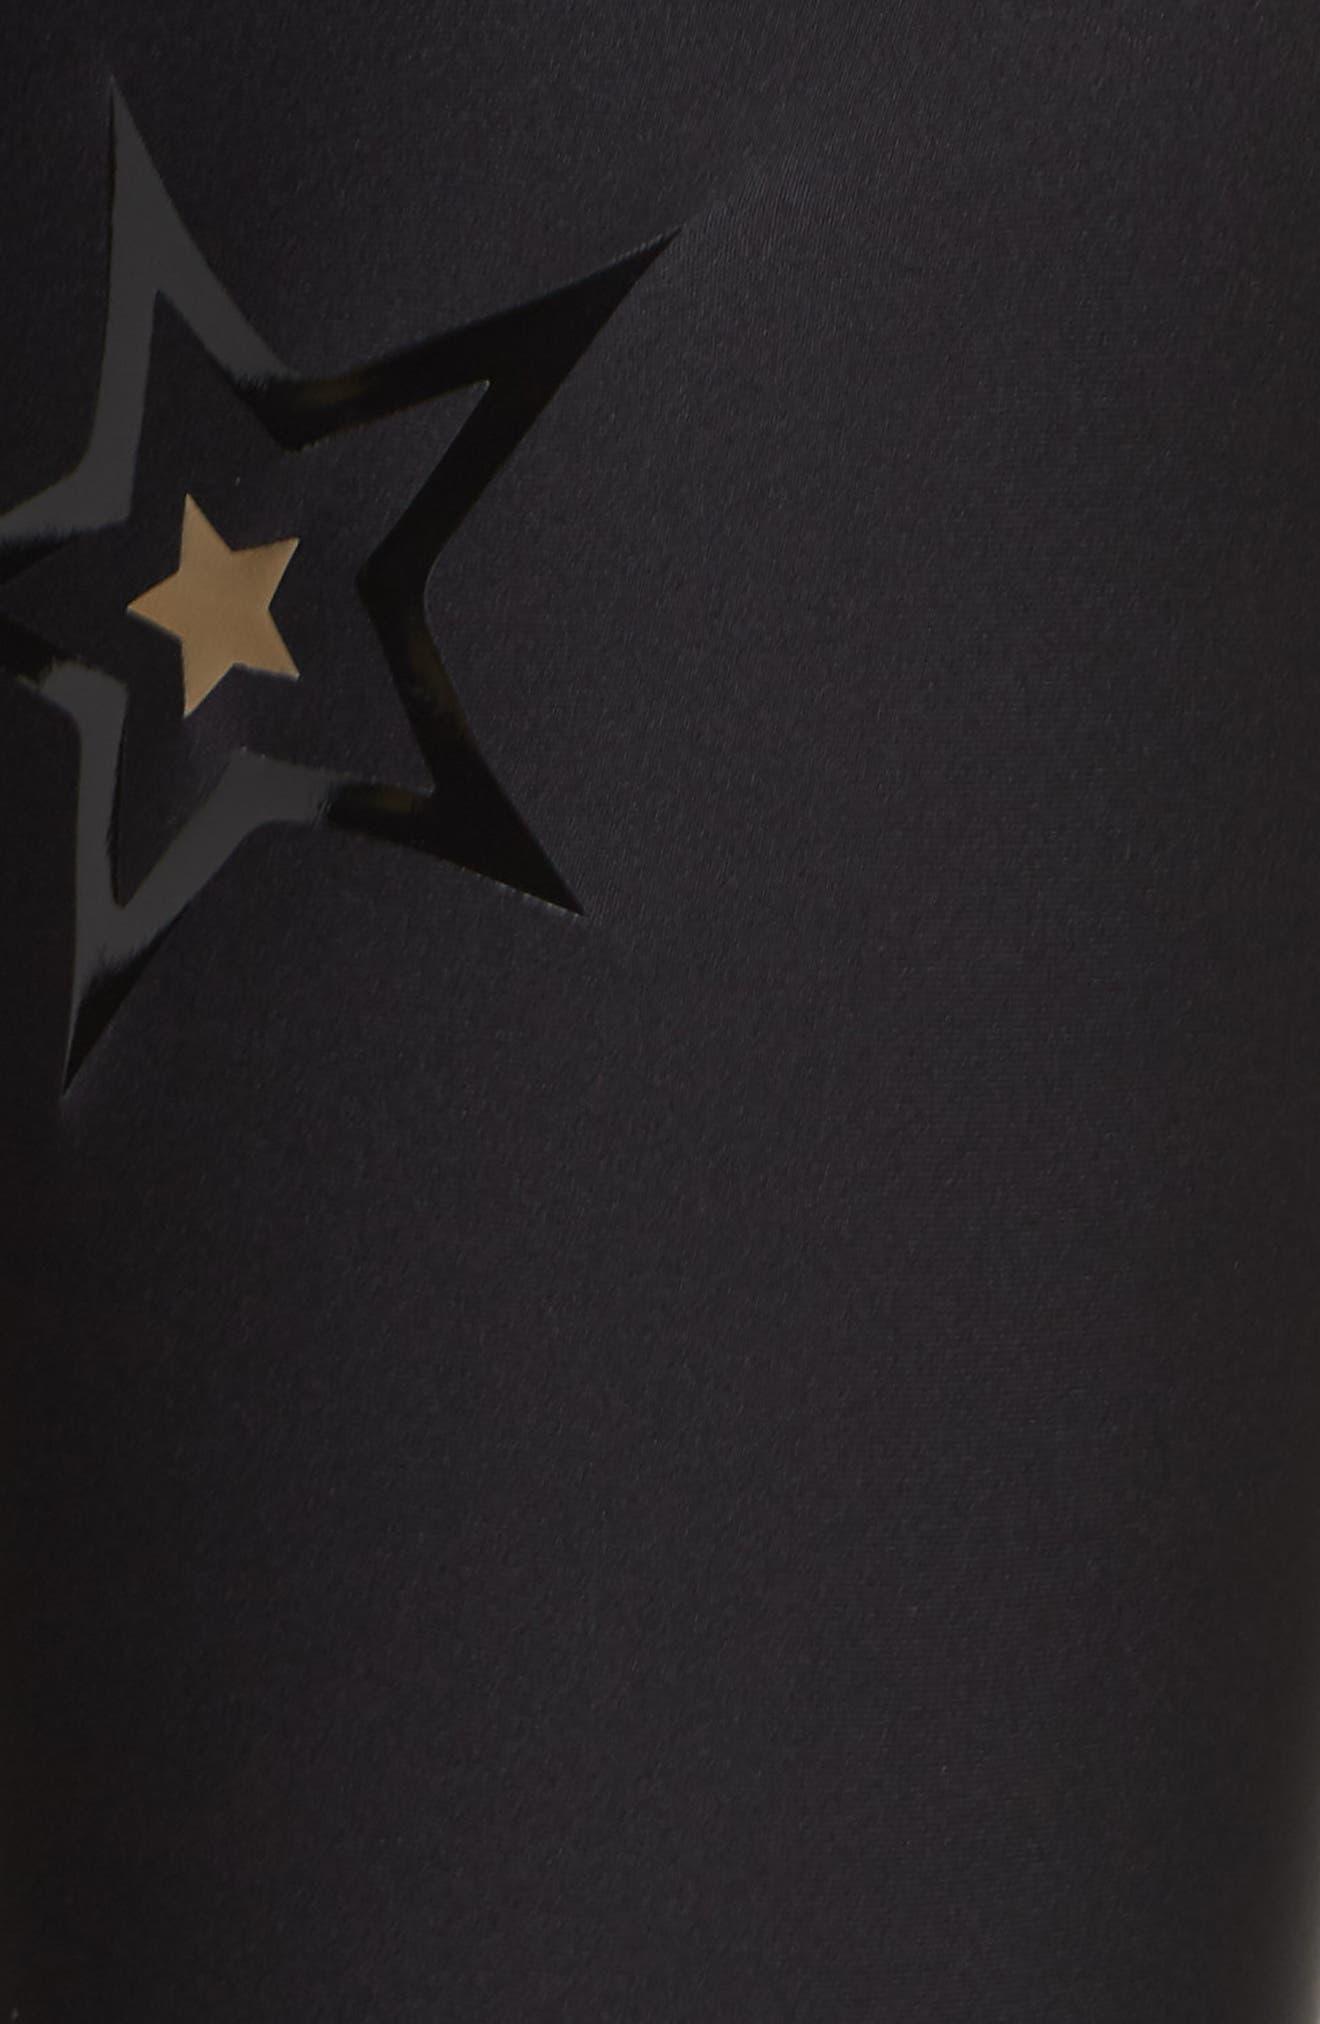 Ultra High Duochrome Pop Star Leggings,                             Alternate thumbnail 6, color,                             NERO PATENT NERO